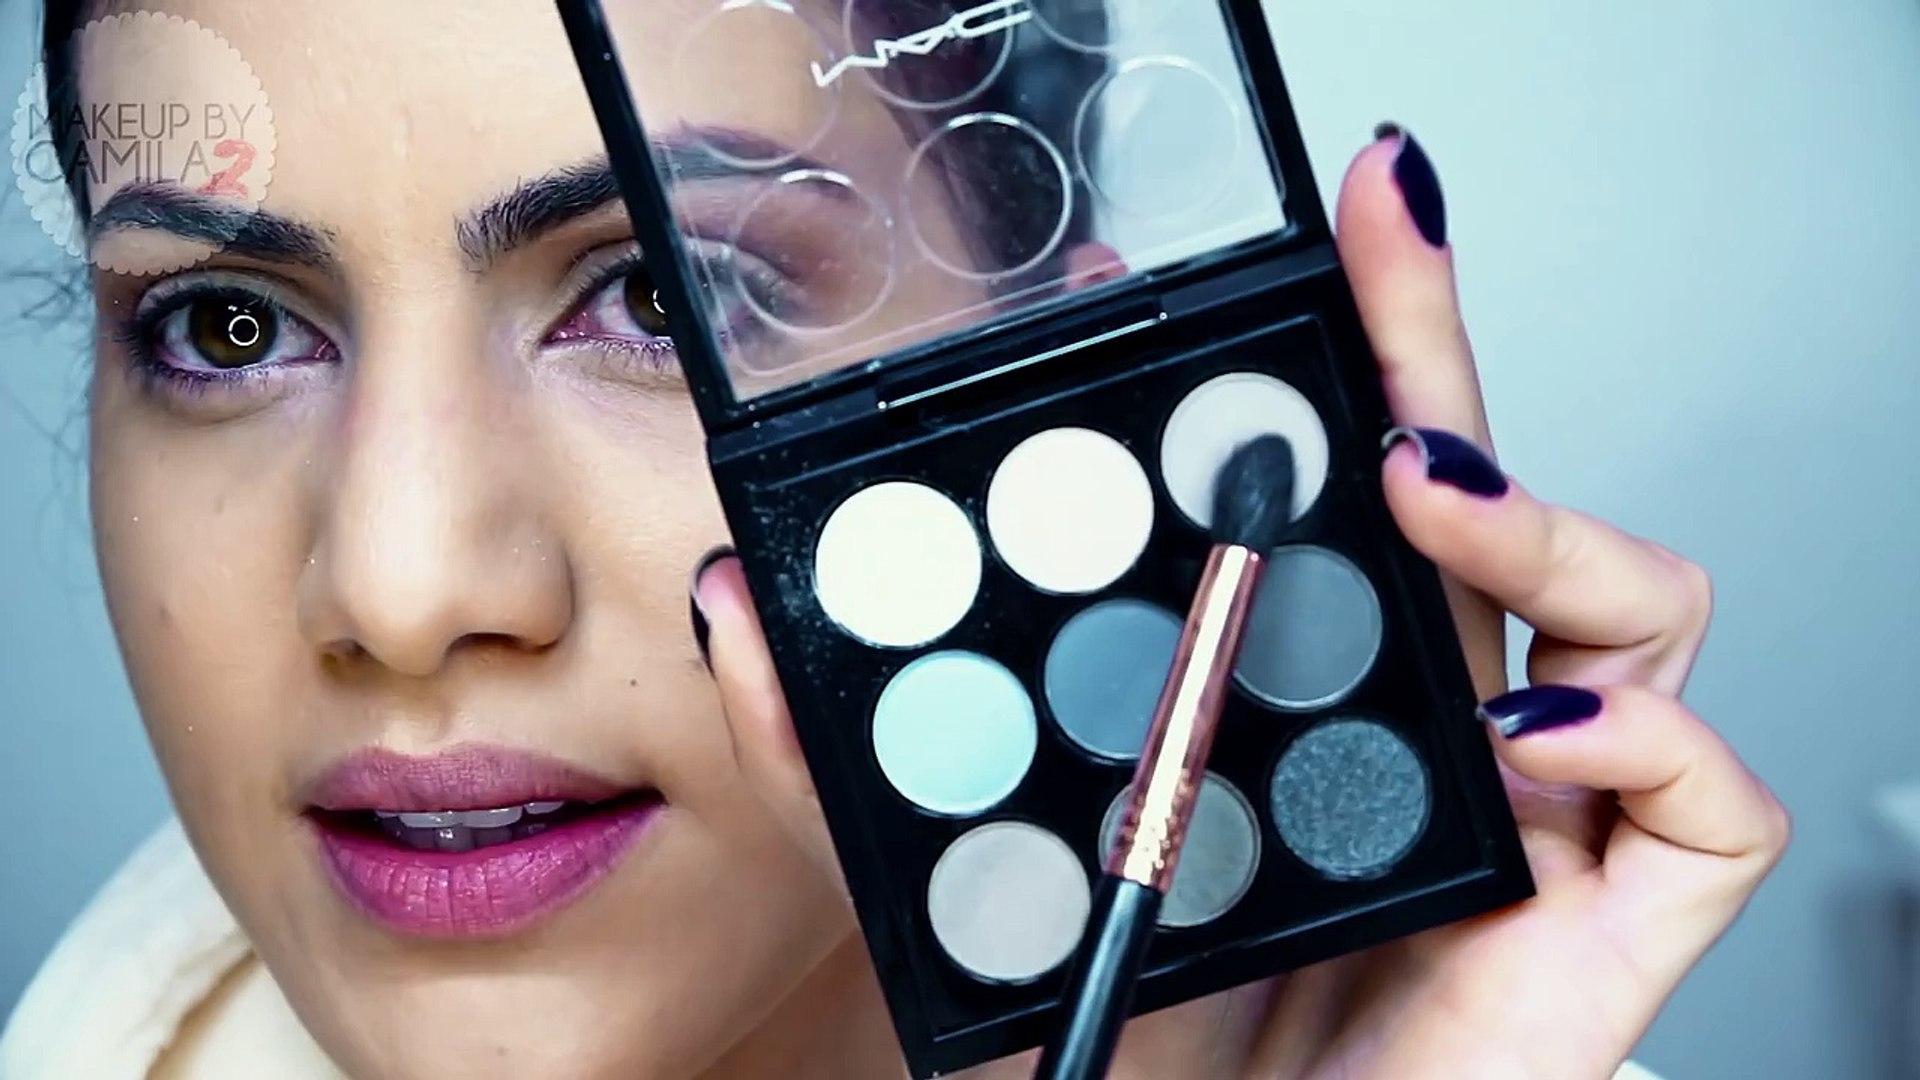 X-Mens Storm Halloween Makeup | Makeup Tutorials and Beauty Reviews | Camila Coelho